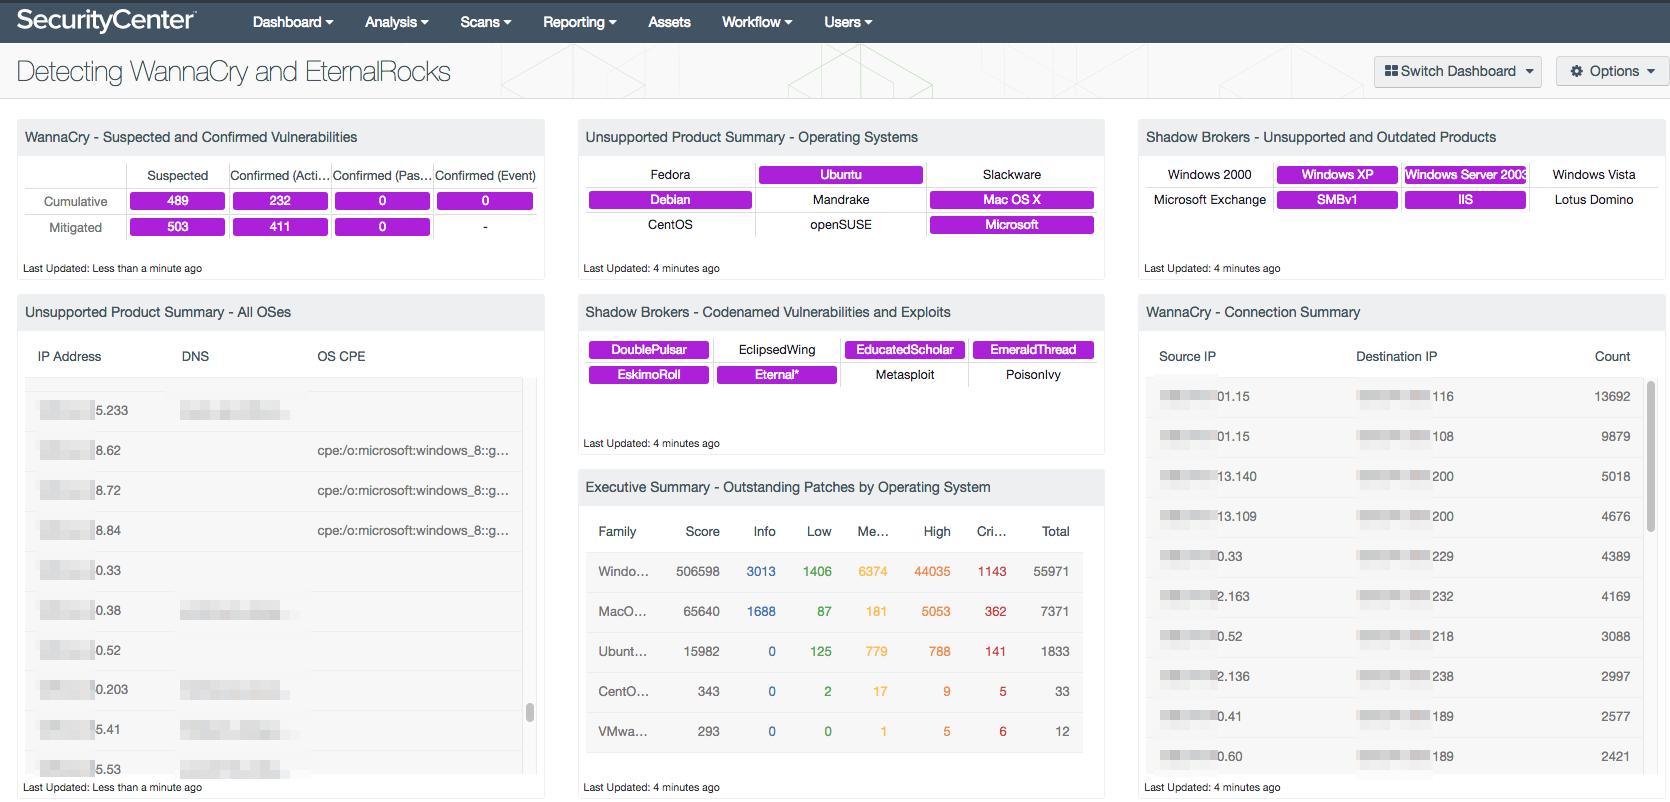 Detecting WannaCry and EternalRocks dashboard